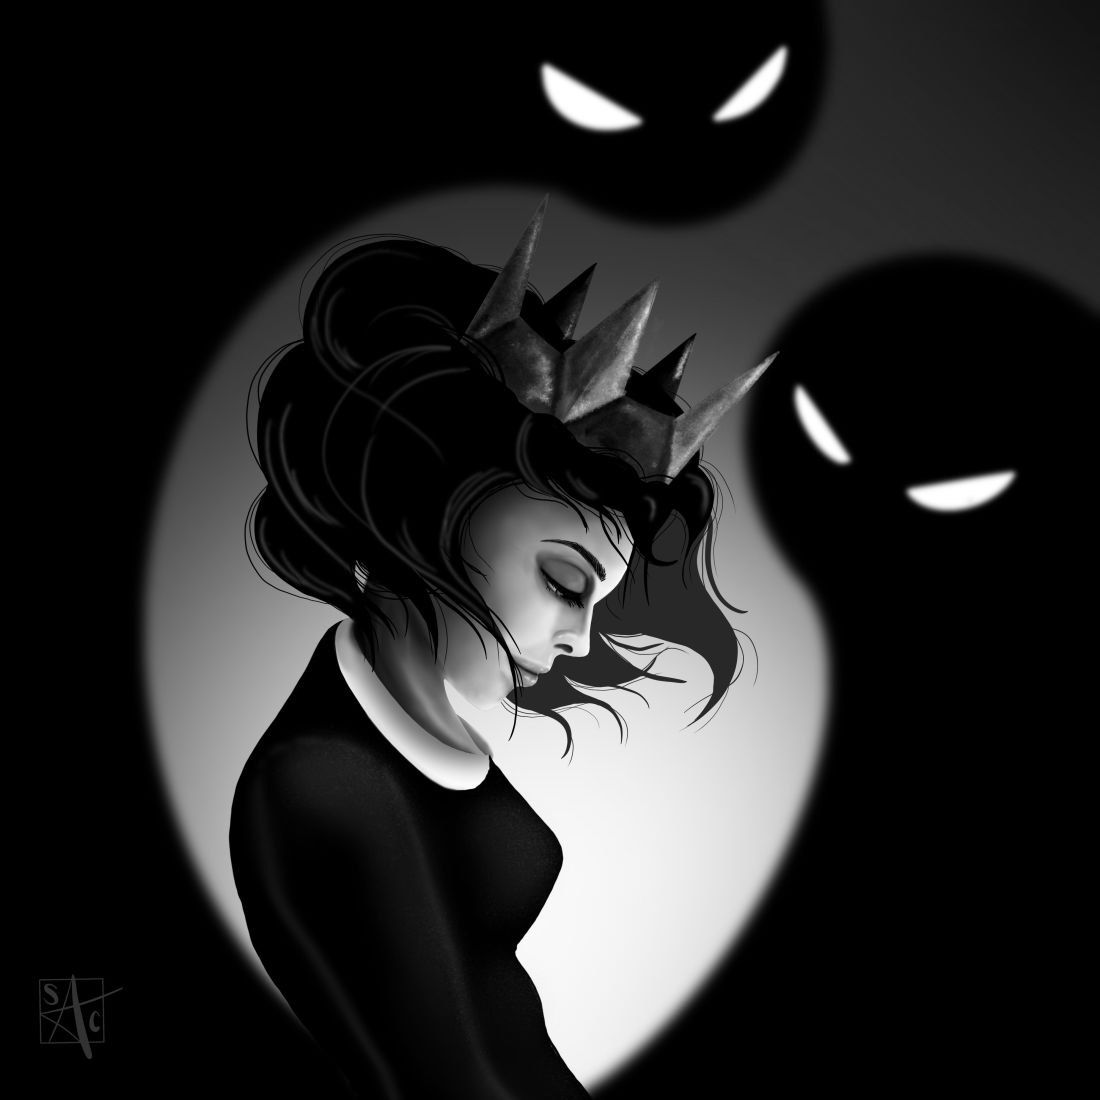 drawing girl crown shadow ghosts